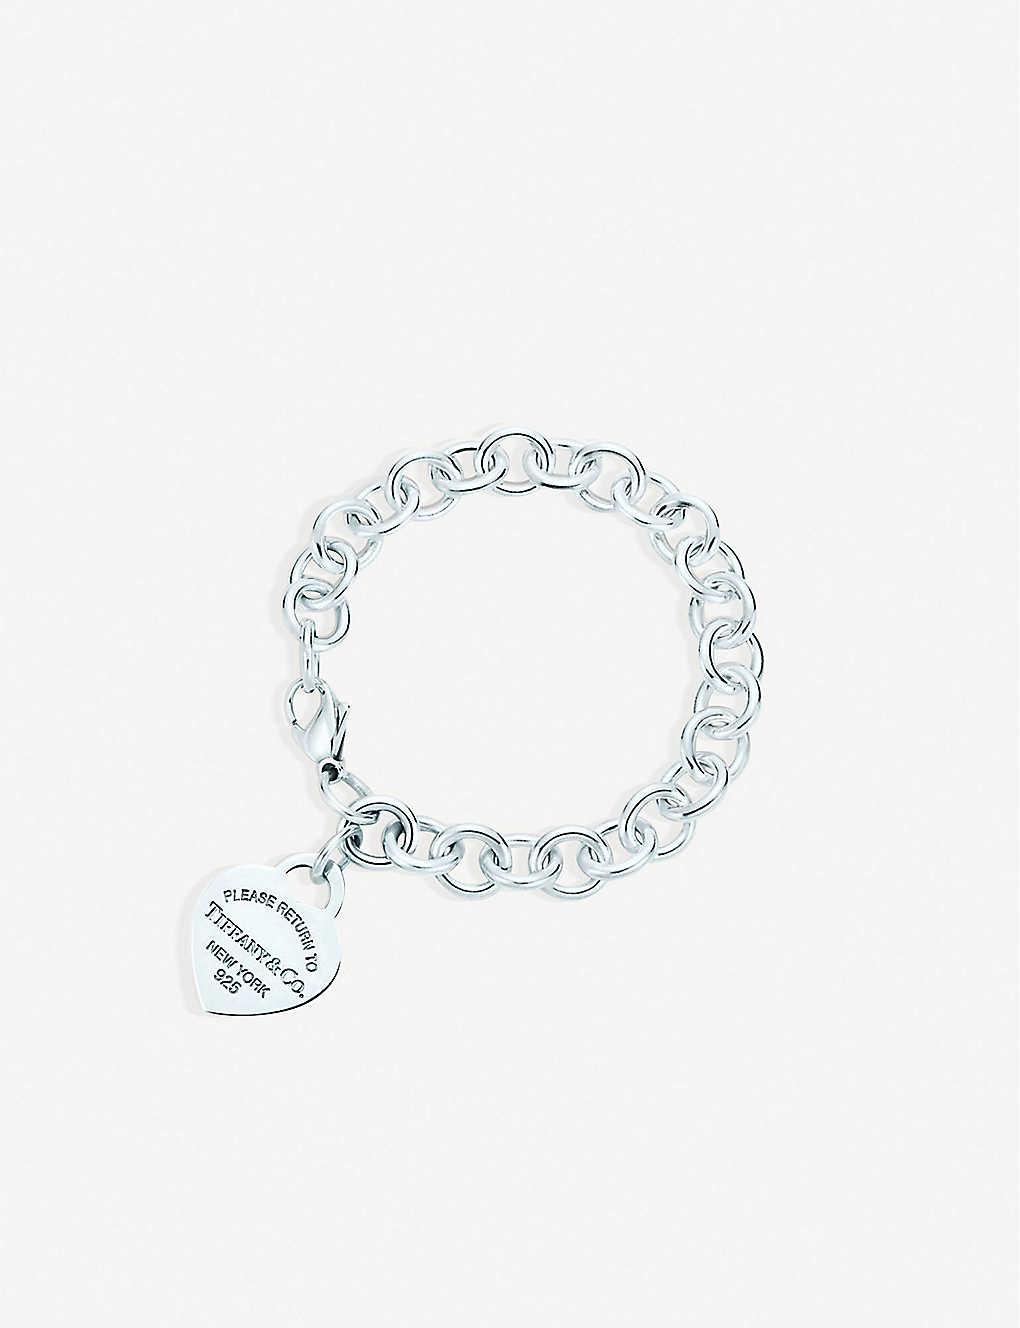 d598afa52 TIFFANY & CO - Return to Tiffany Heart Tag Charm Bracelet ...